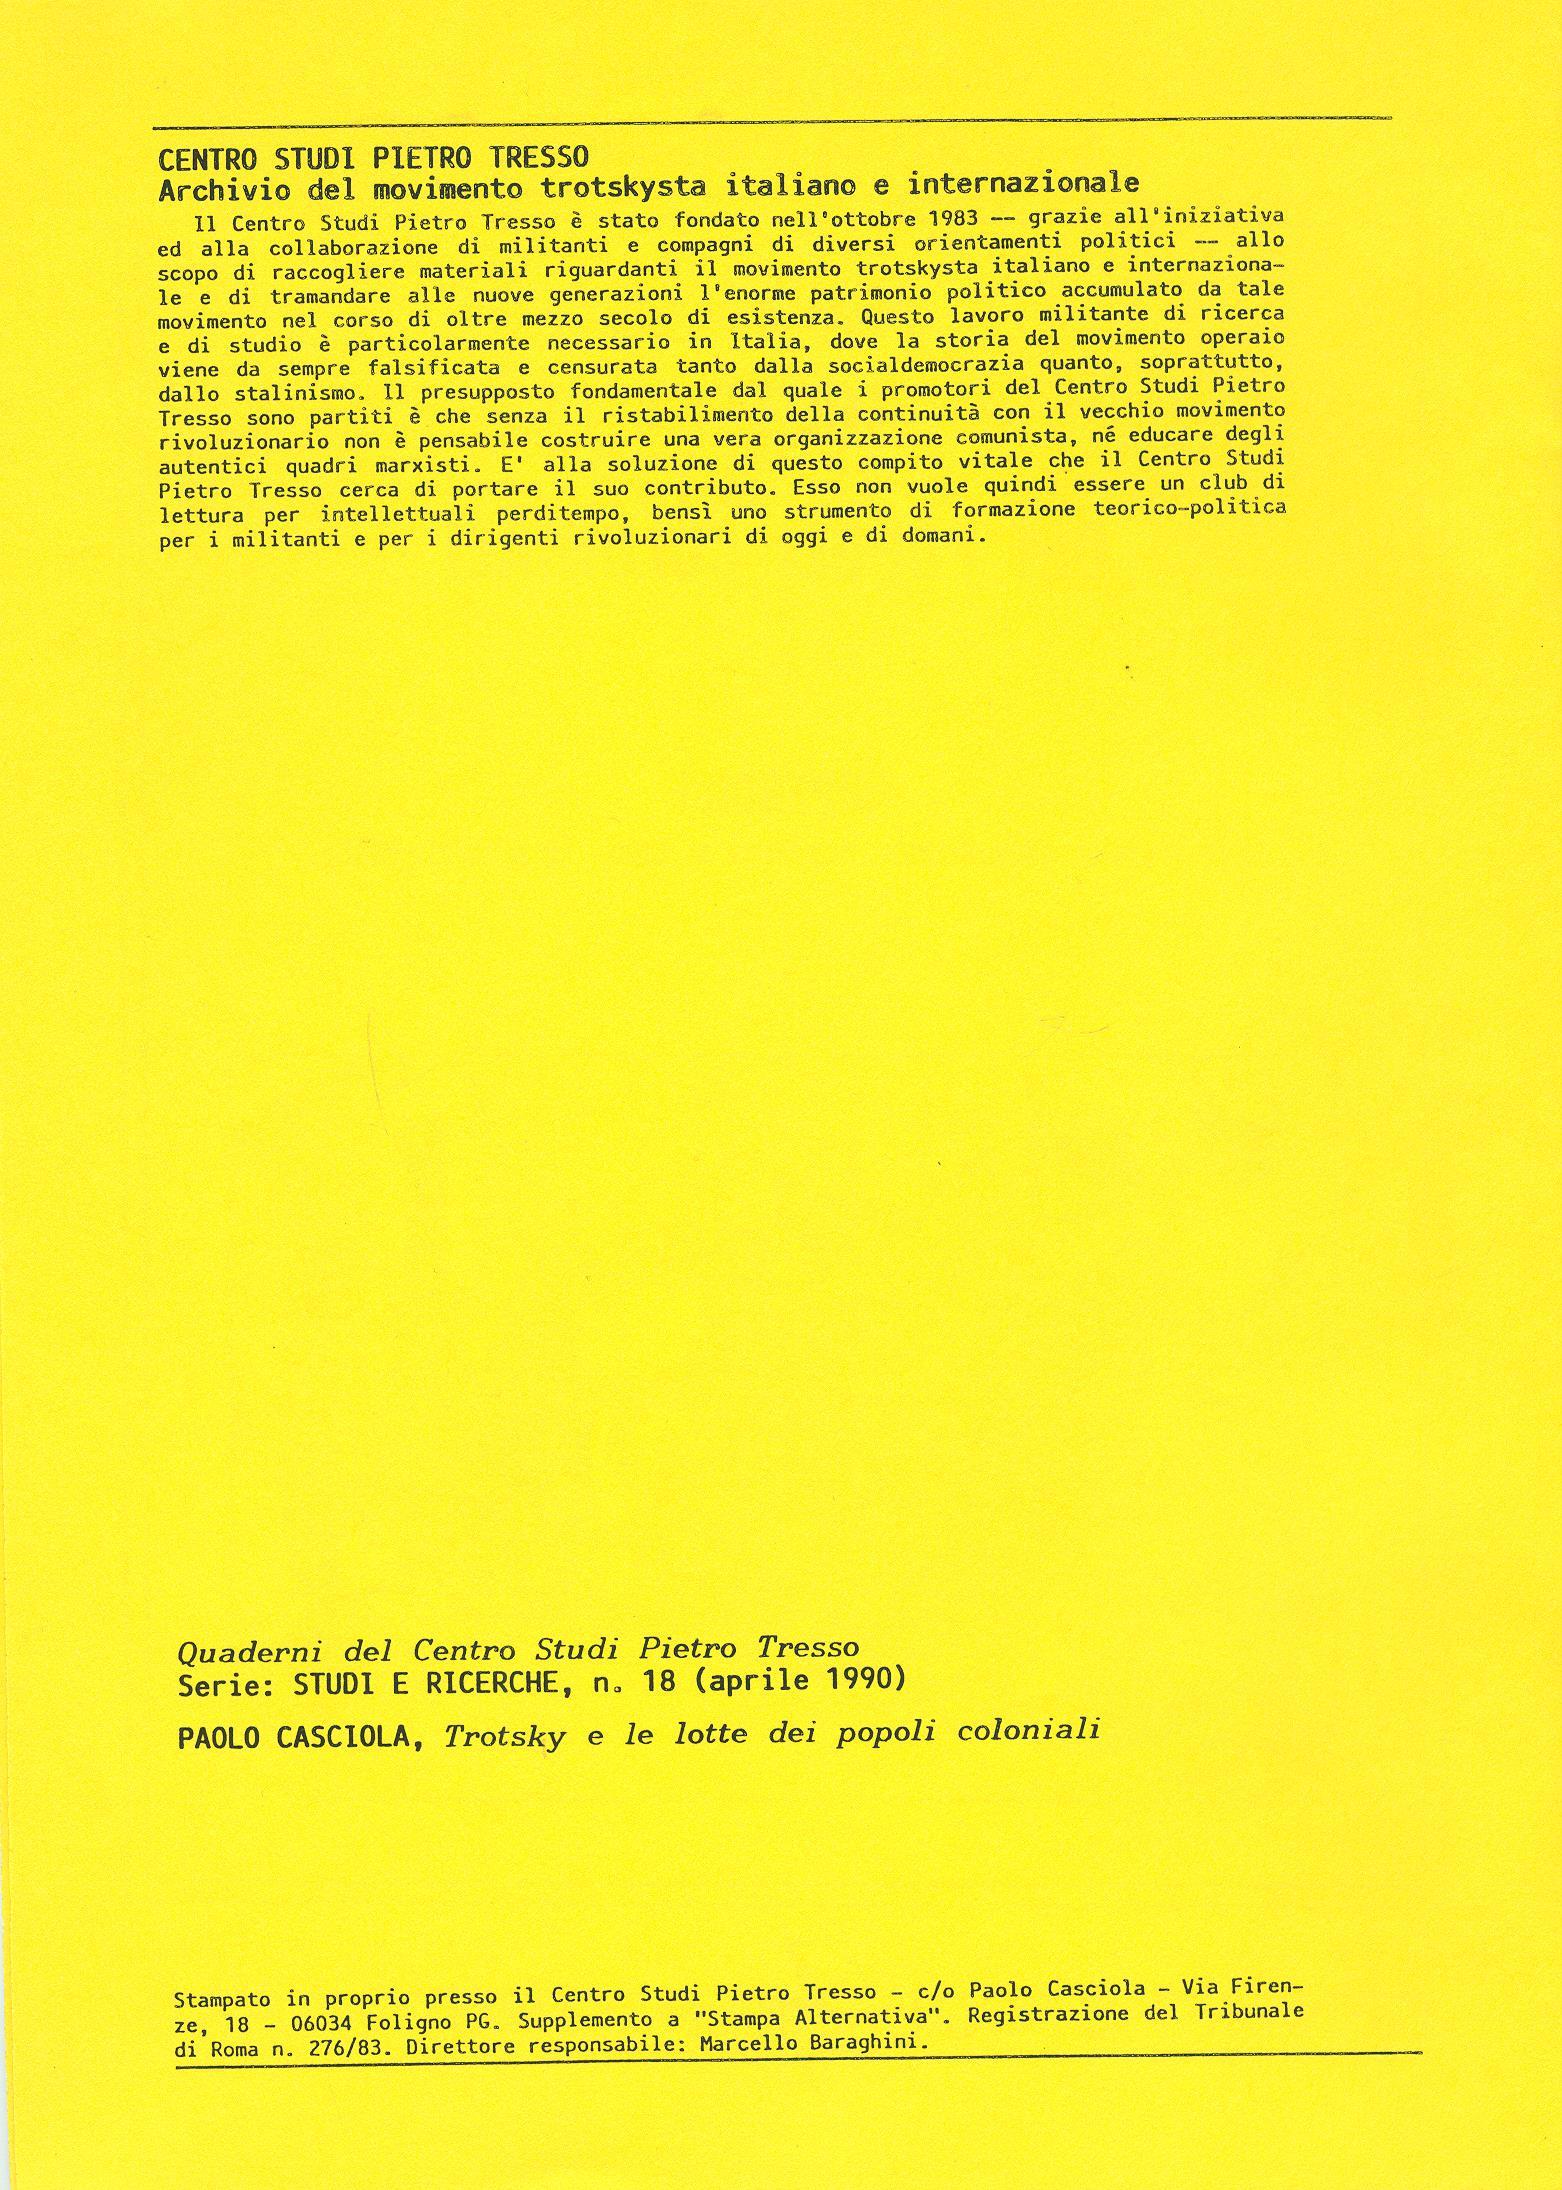 Studi e Ricerche n. 18 (aprile 1990) - pag. II